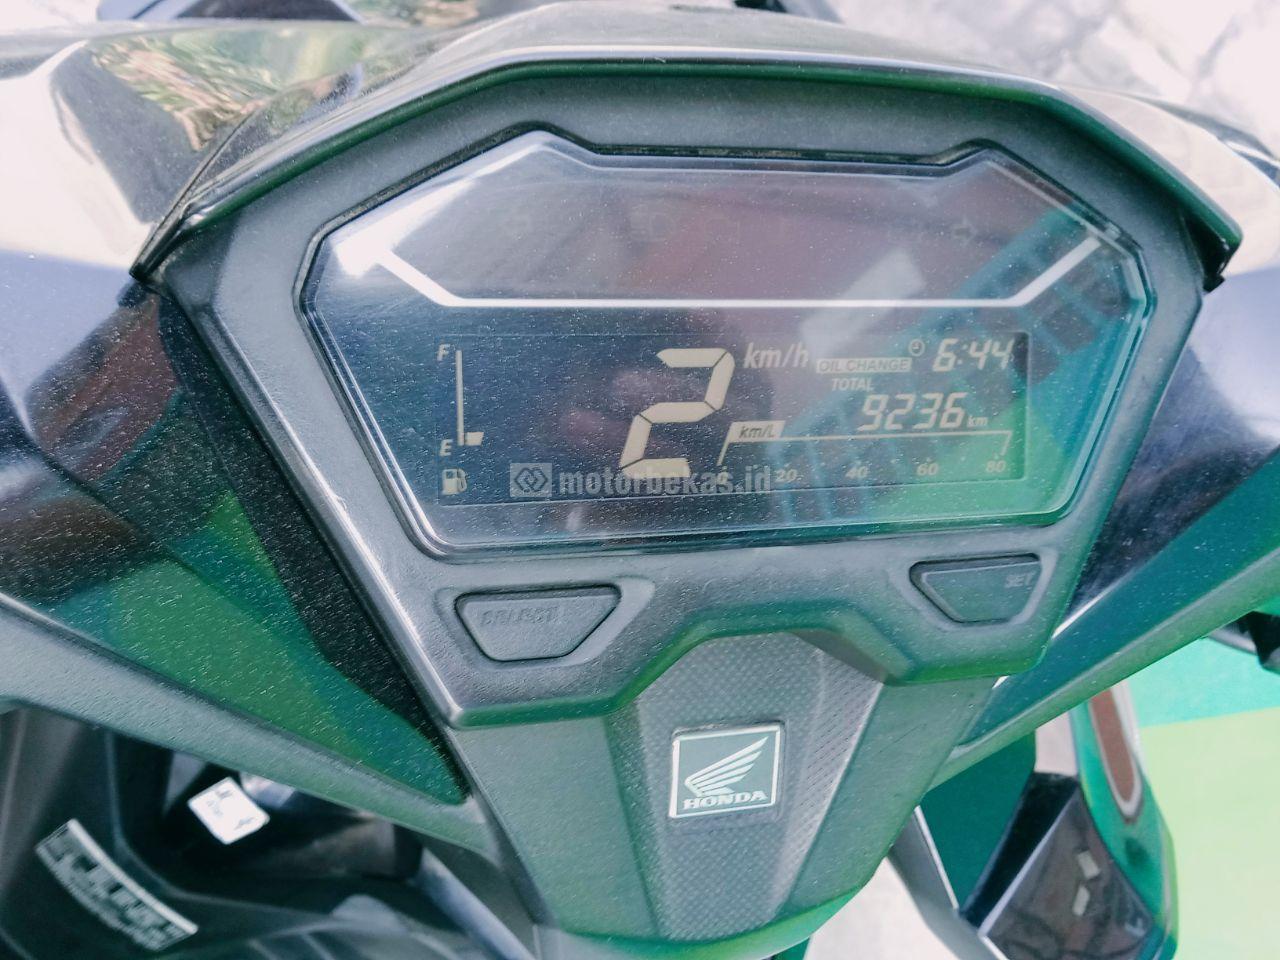 HONDA VARIO 125 FI 986 motorbekas.id